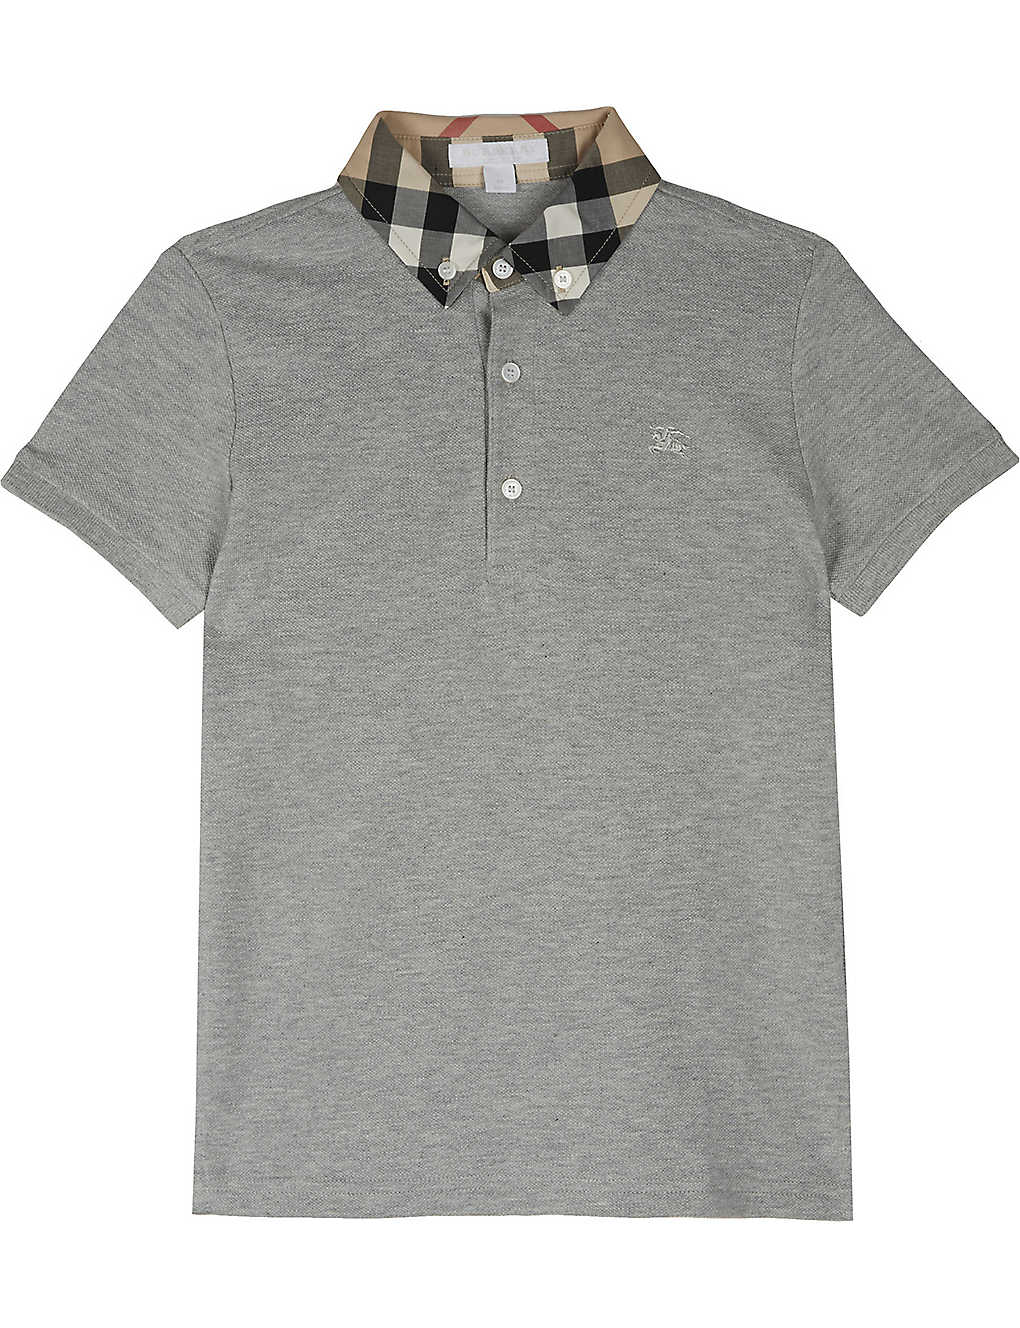 6f0fe0dfa BURBERRY - William cotton polo shirt 4-14 years